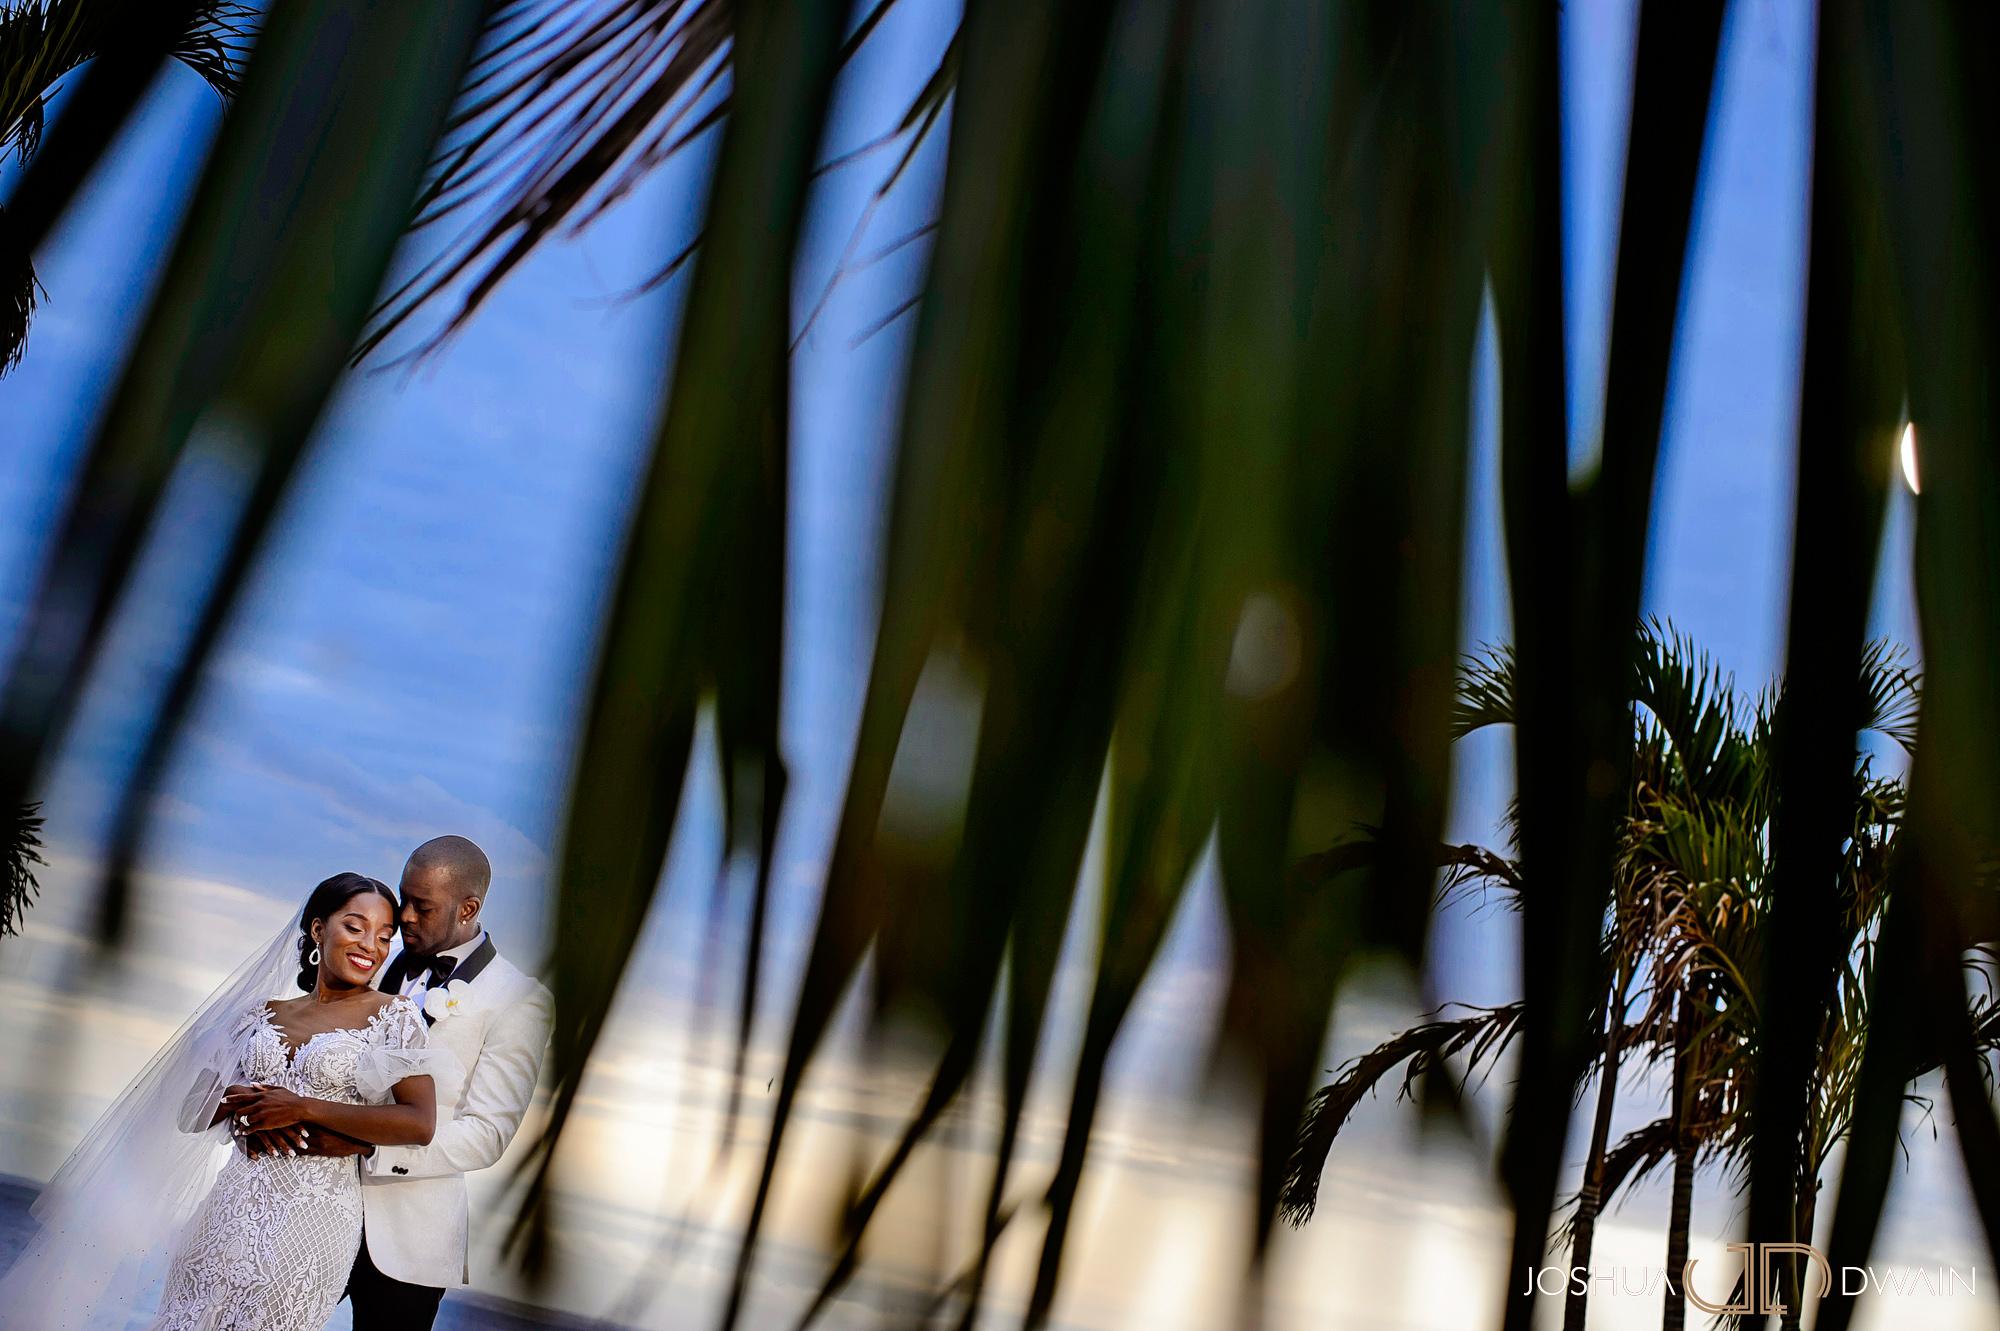 shari-deron-032-crescent-beach-club-long-island-wedding-photographer-joshua-dwain.jpg